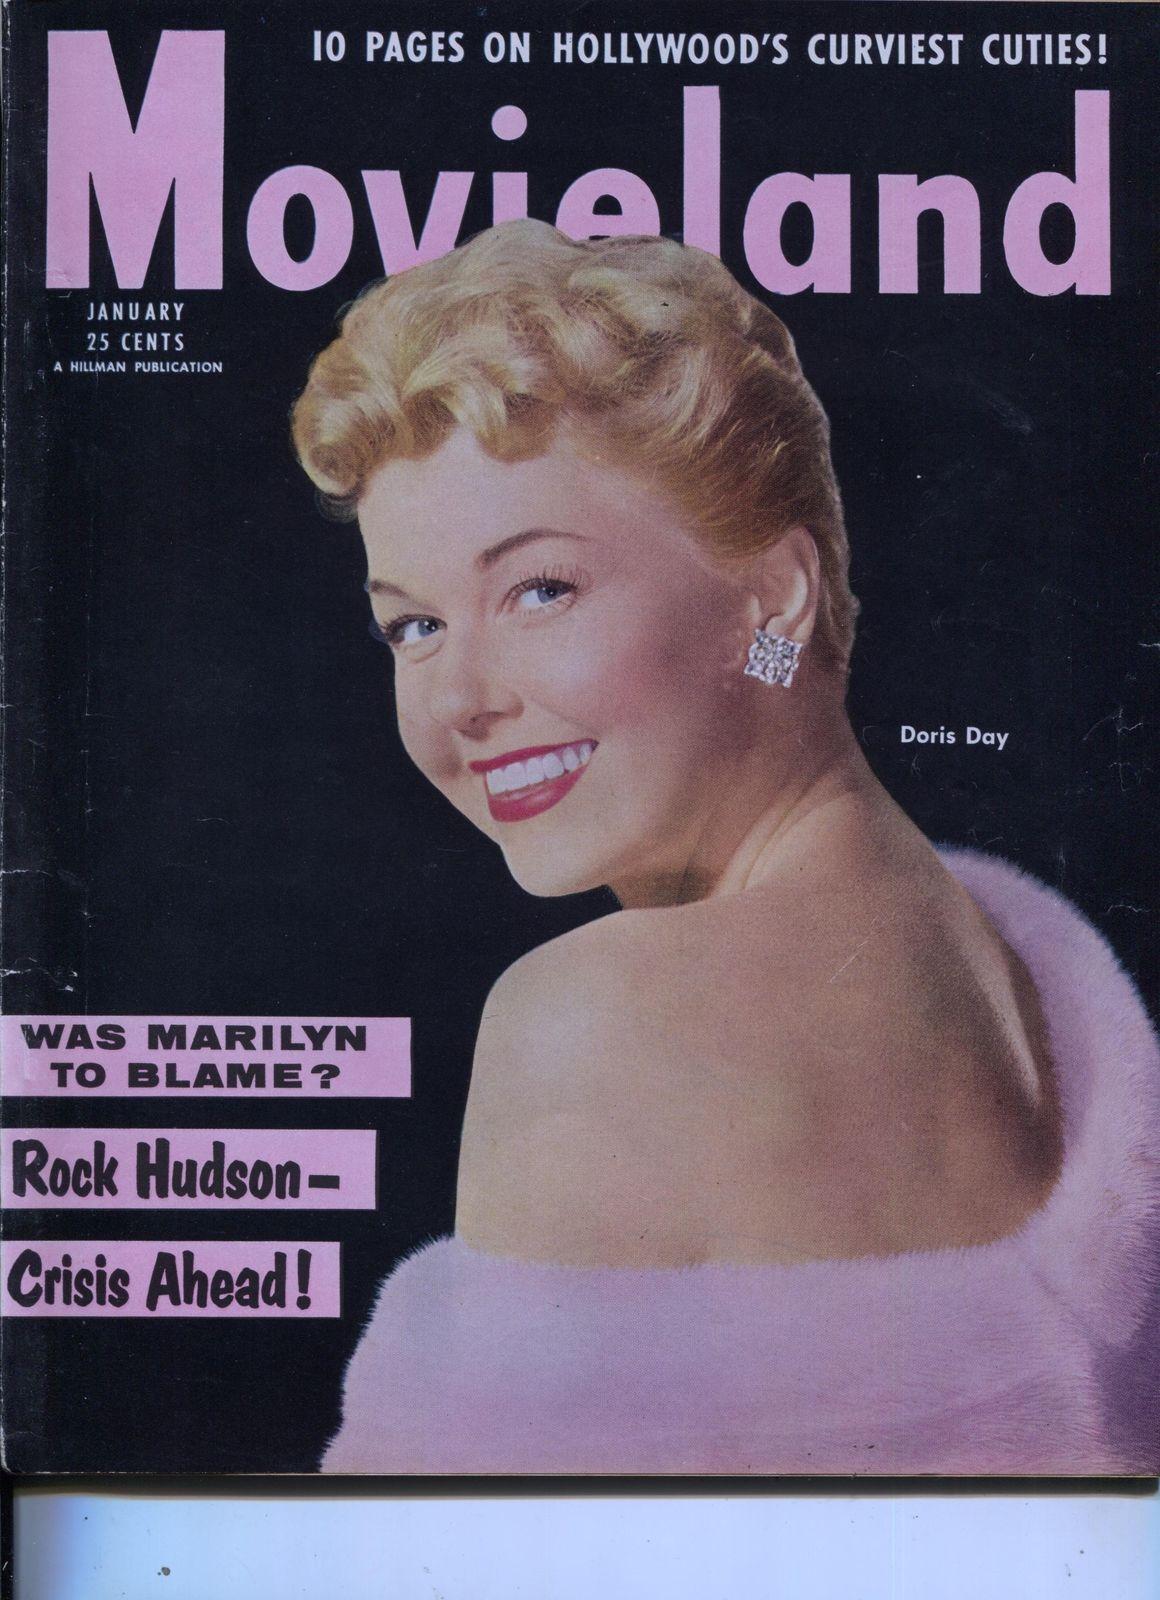 Movie Life Doris Day Marilyn Monroe Judy Garland Audrey Hepburn Jan 1955 Hipcomic